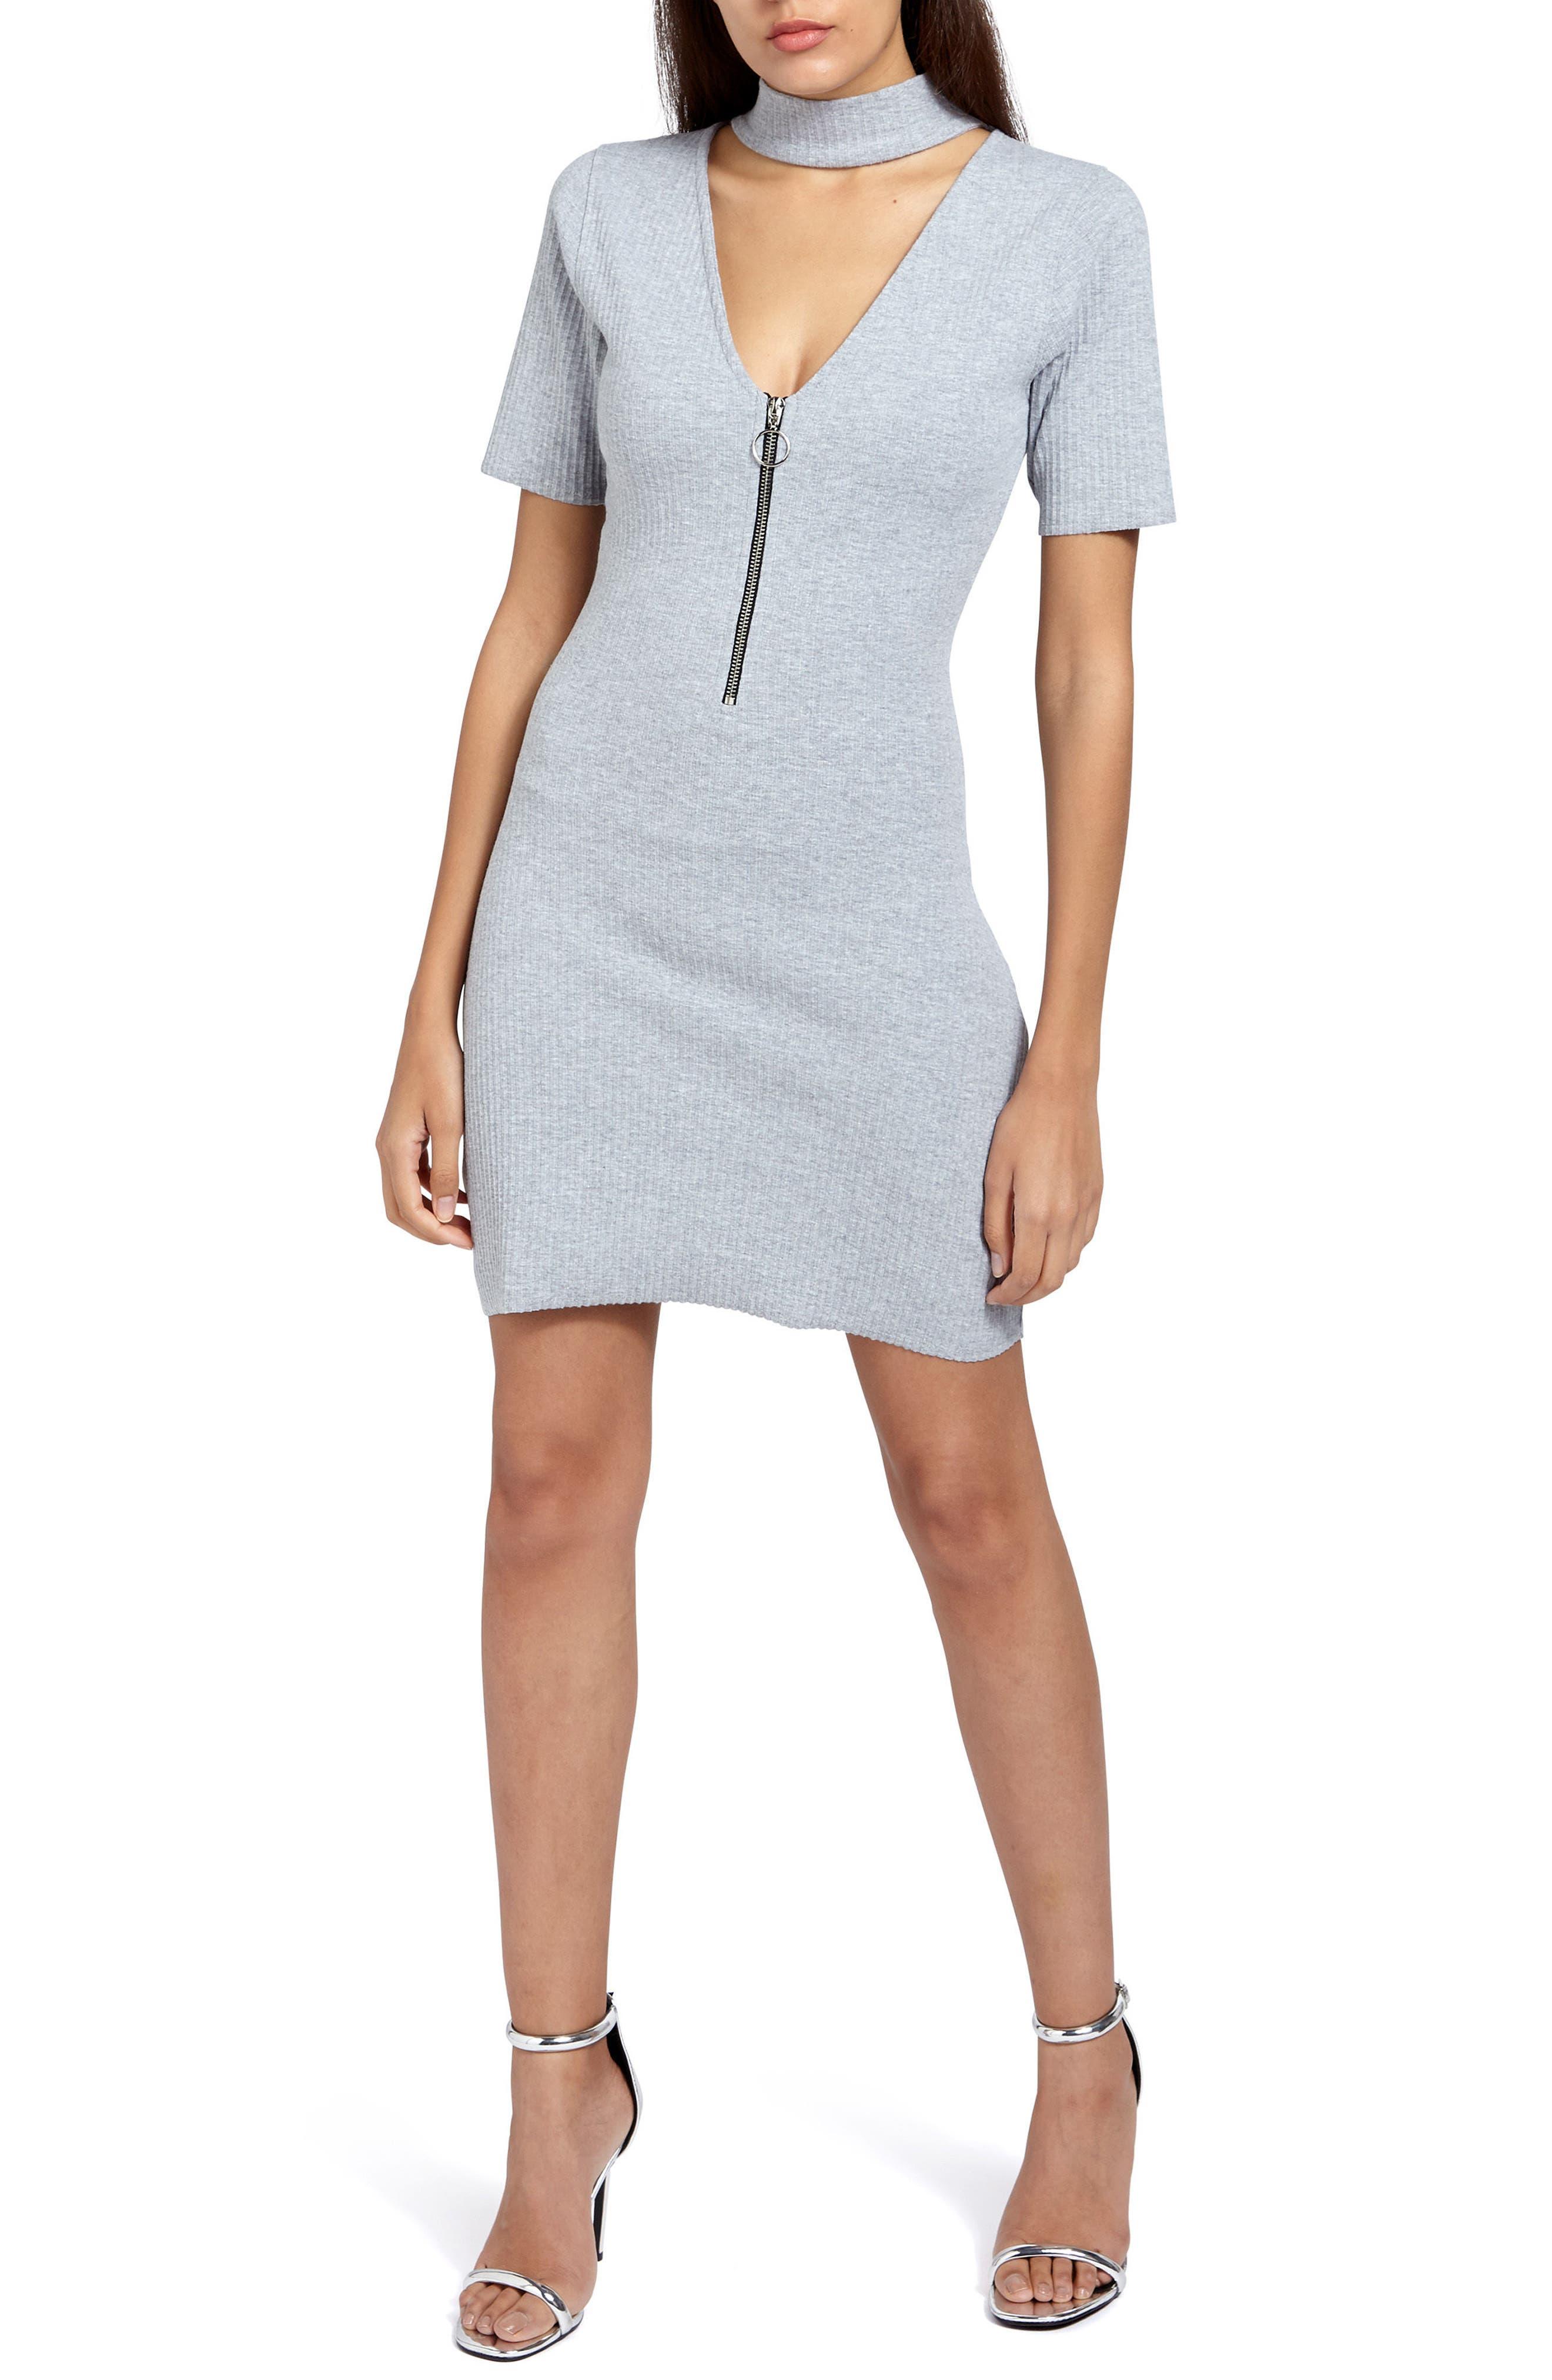 Missguided Choker Zip Body-Con Dress